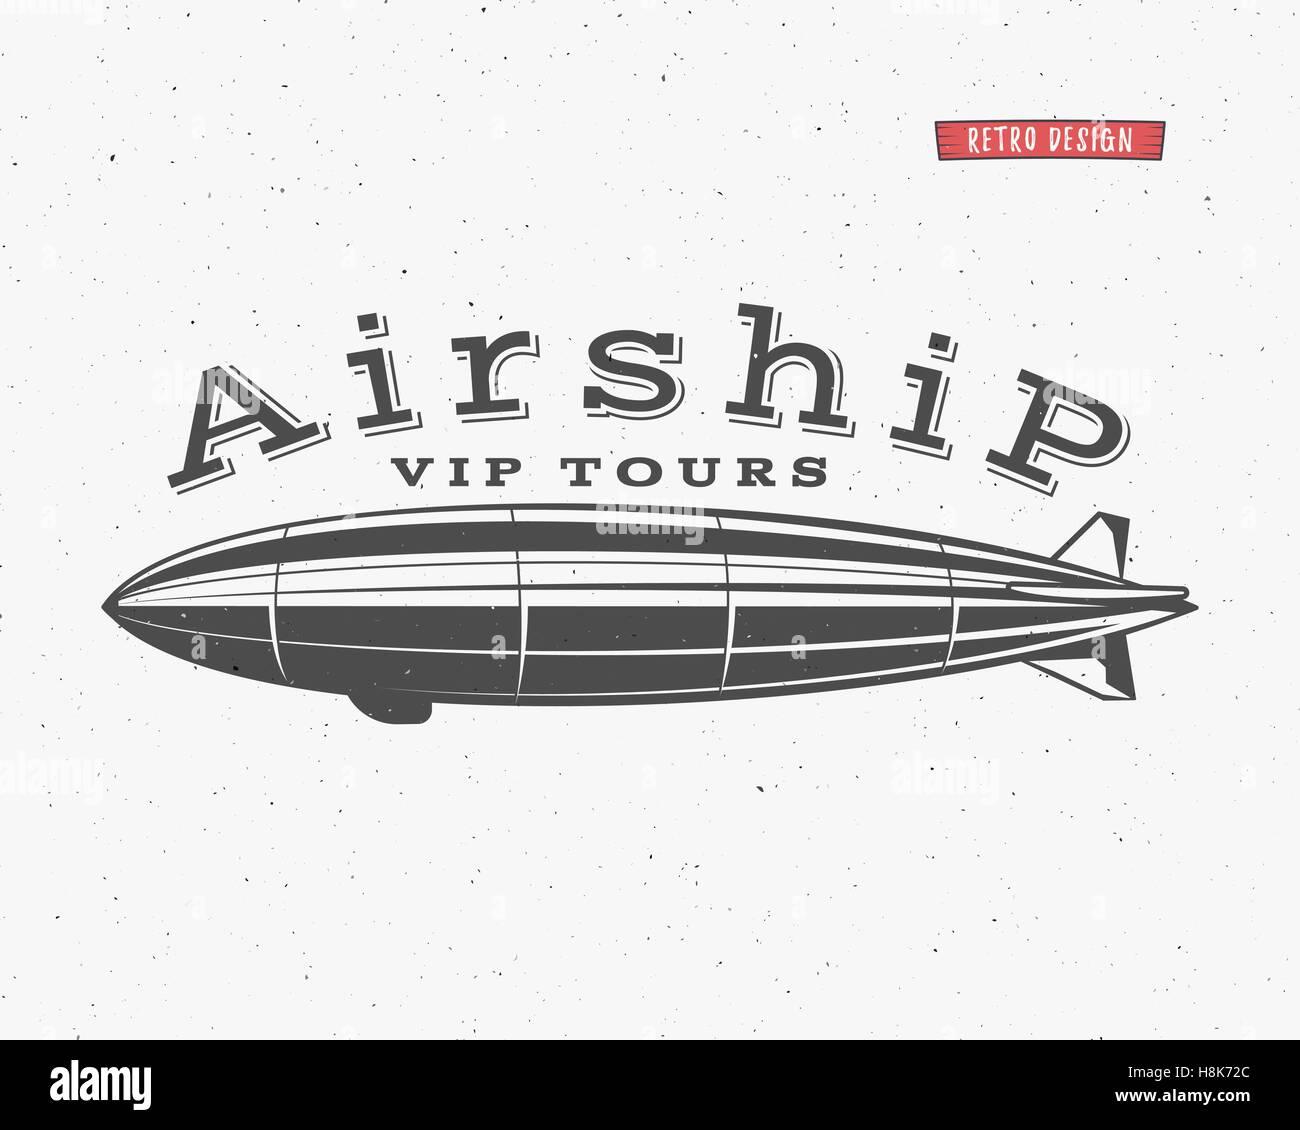 vintage airship background retro dirigible balloon vip tours label